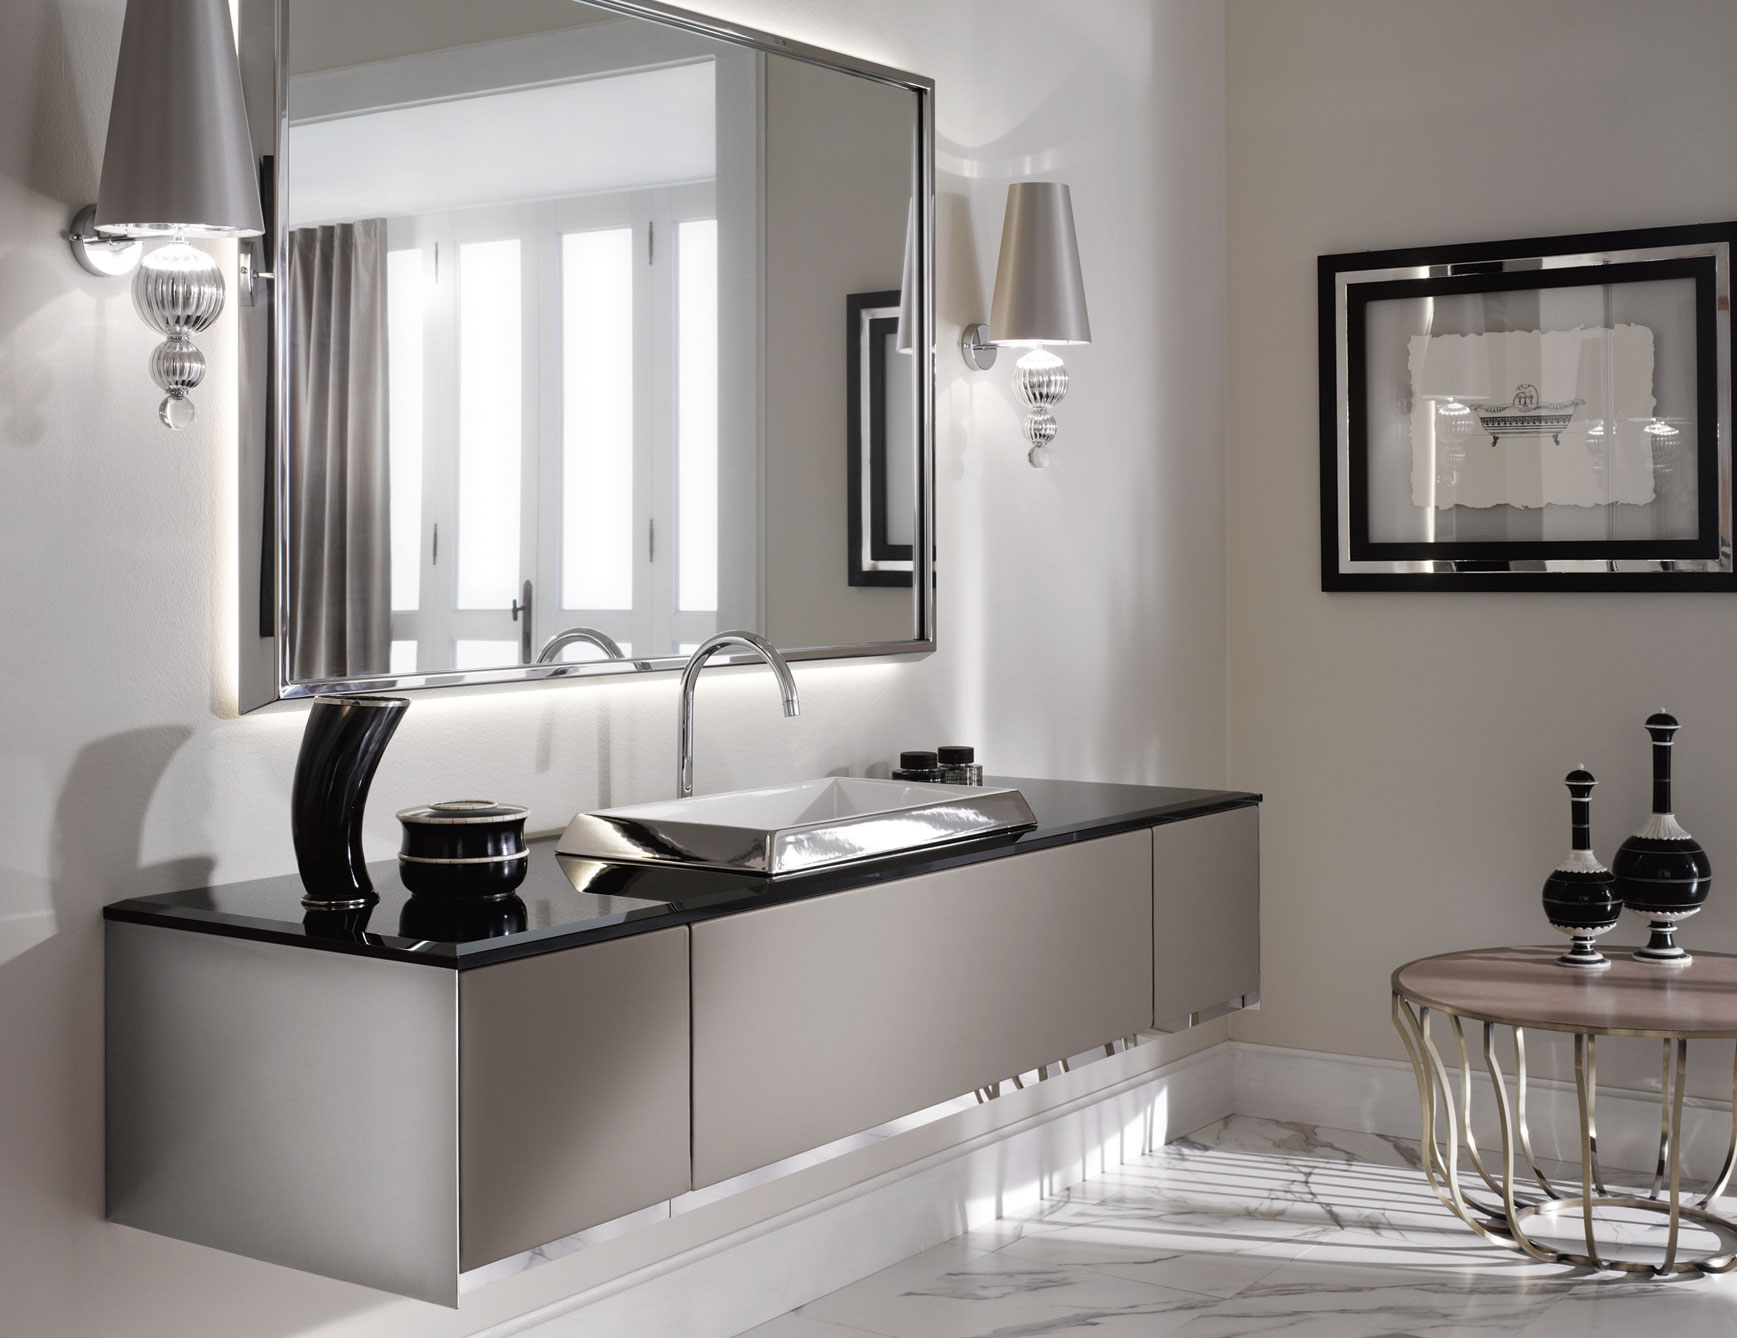 40 Double Sinks And Vanity